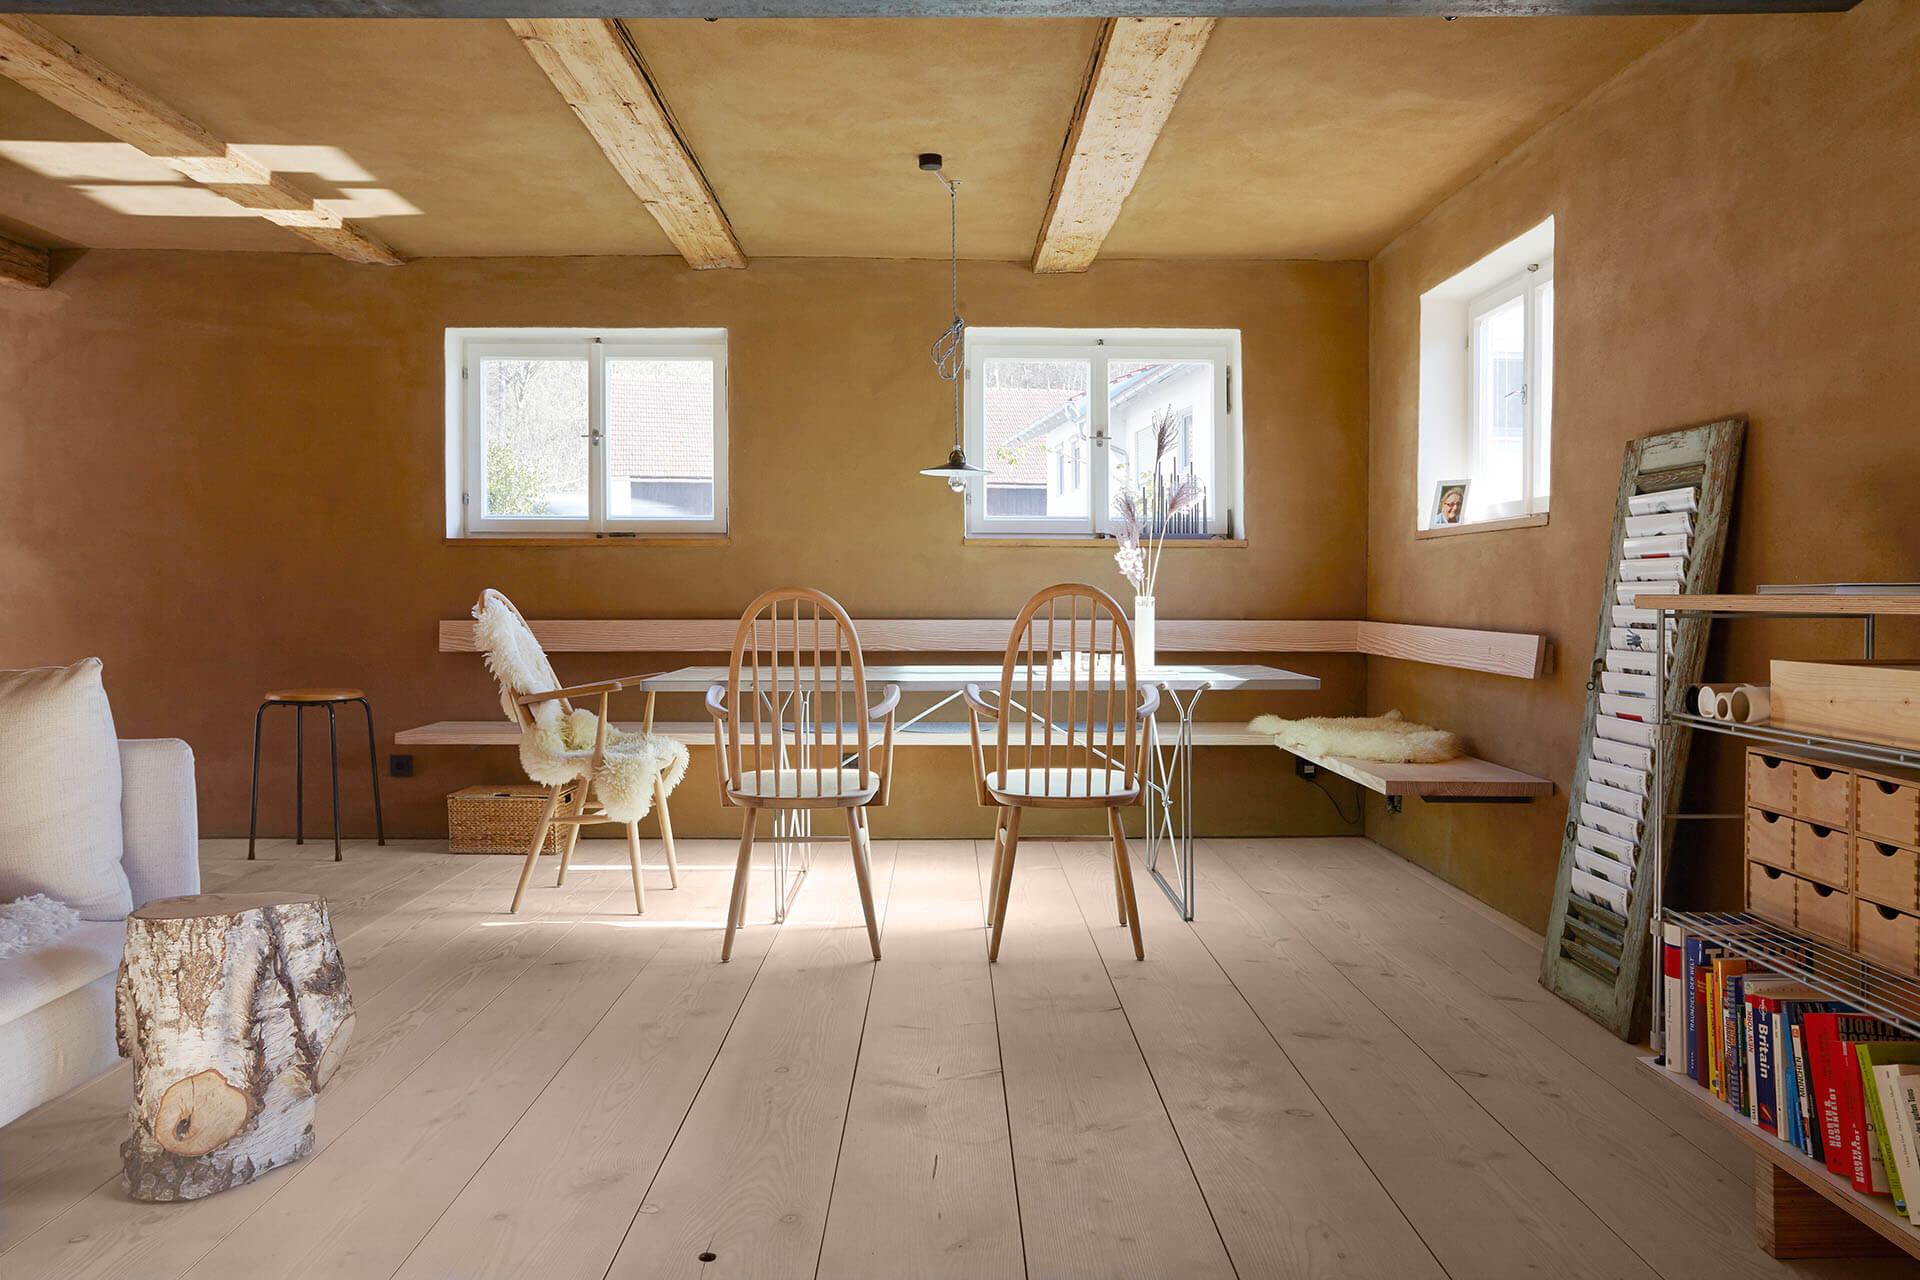 farmhouse with pur natur floorboards pur natur en. Black Bedroom Furniture Sets. Home Design Ideas